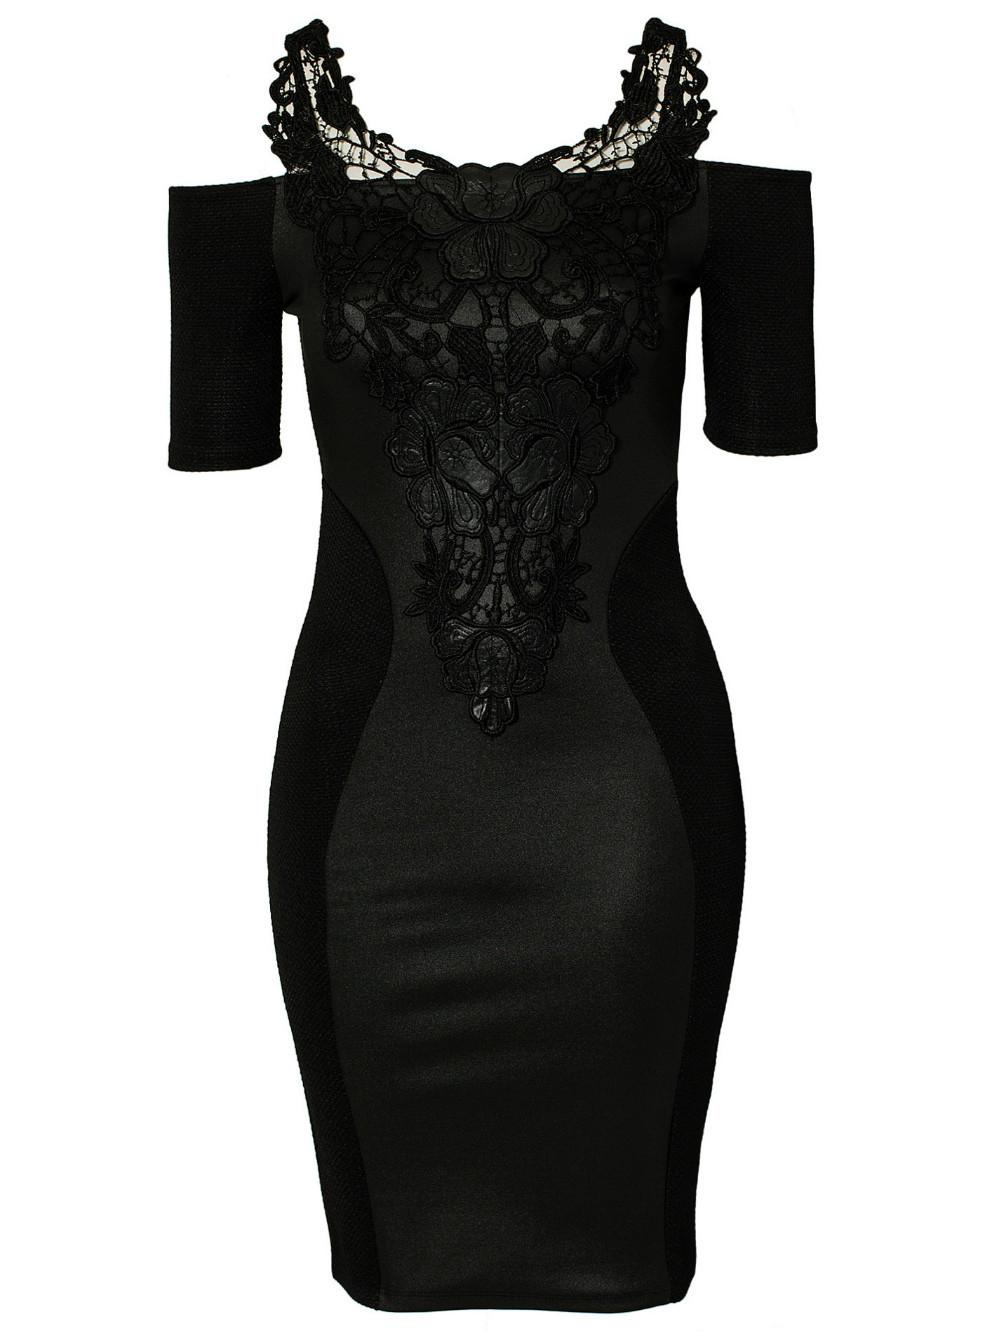 9039 bodycon dress (5)